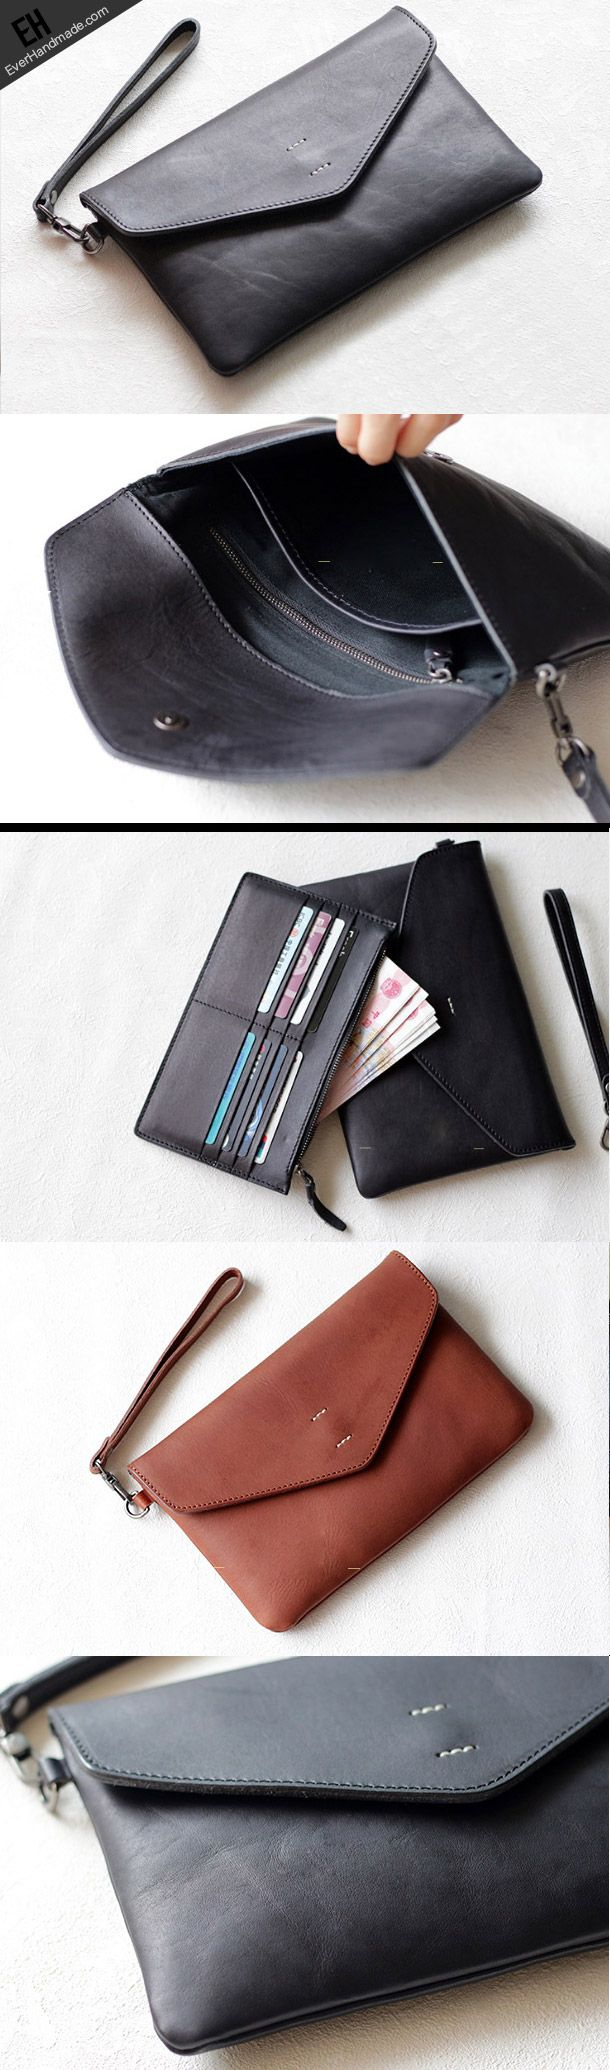 b817852f8072 Handmade Genuine leather bifold envelope clutch purse long wallet ...